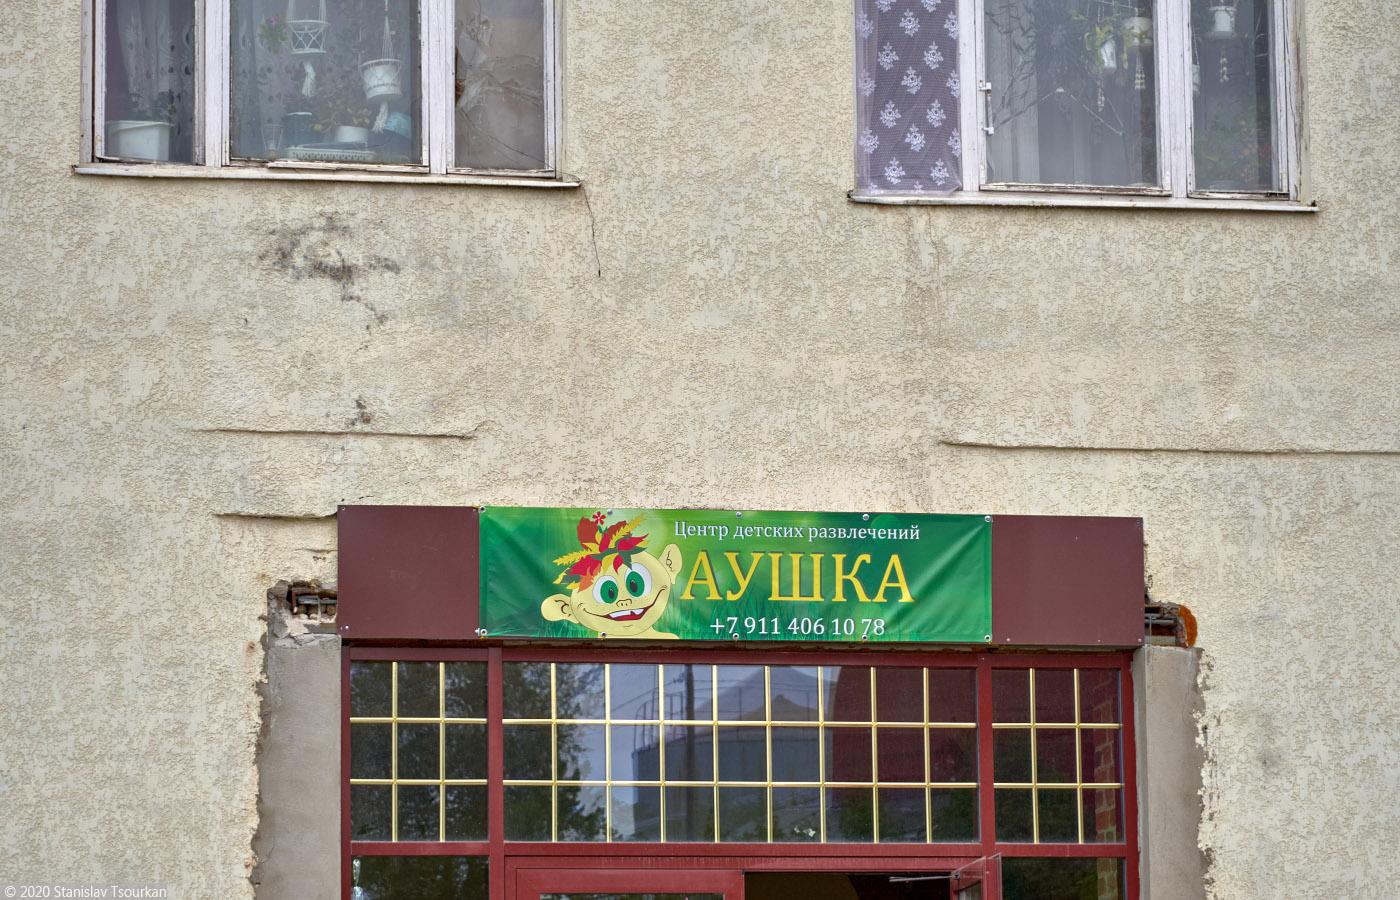 Карелия, республика Карелия, Сортавала, russia, karjala, sortavala, аушка